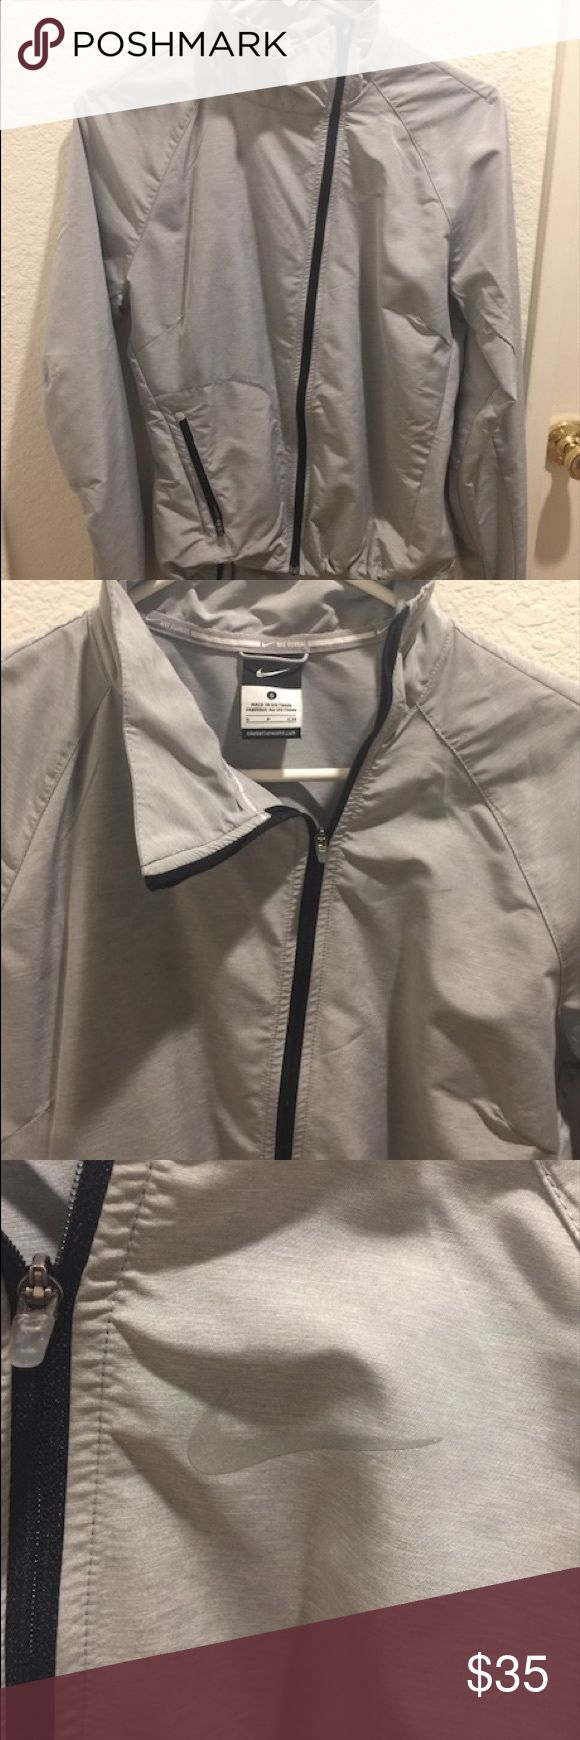 Nike running jacket Light weight grey Nike running jacket. Very thin and waterproof in the rain. Nike Jackets & Coats